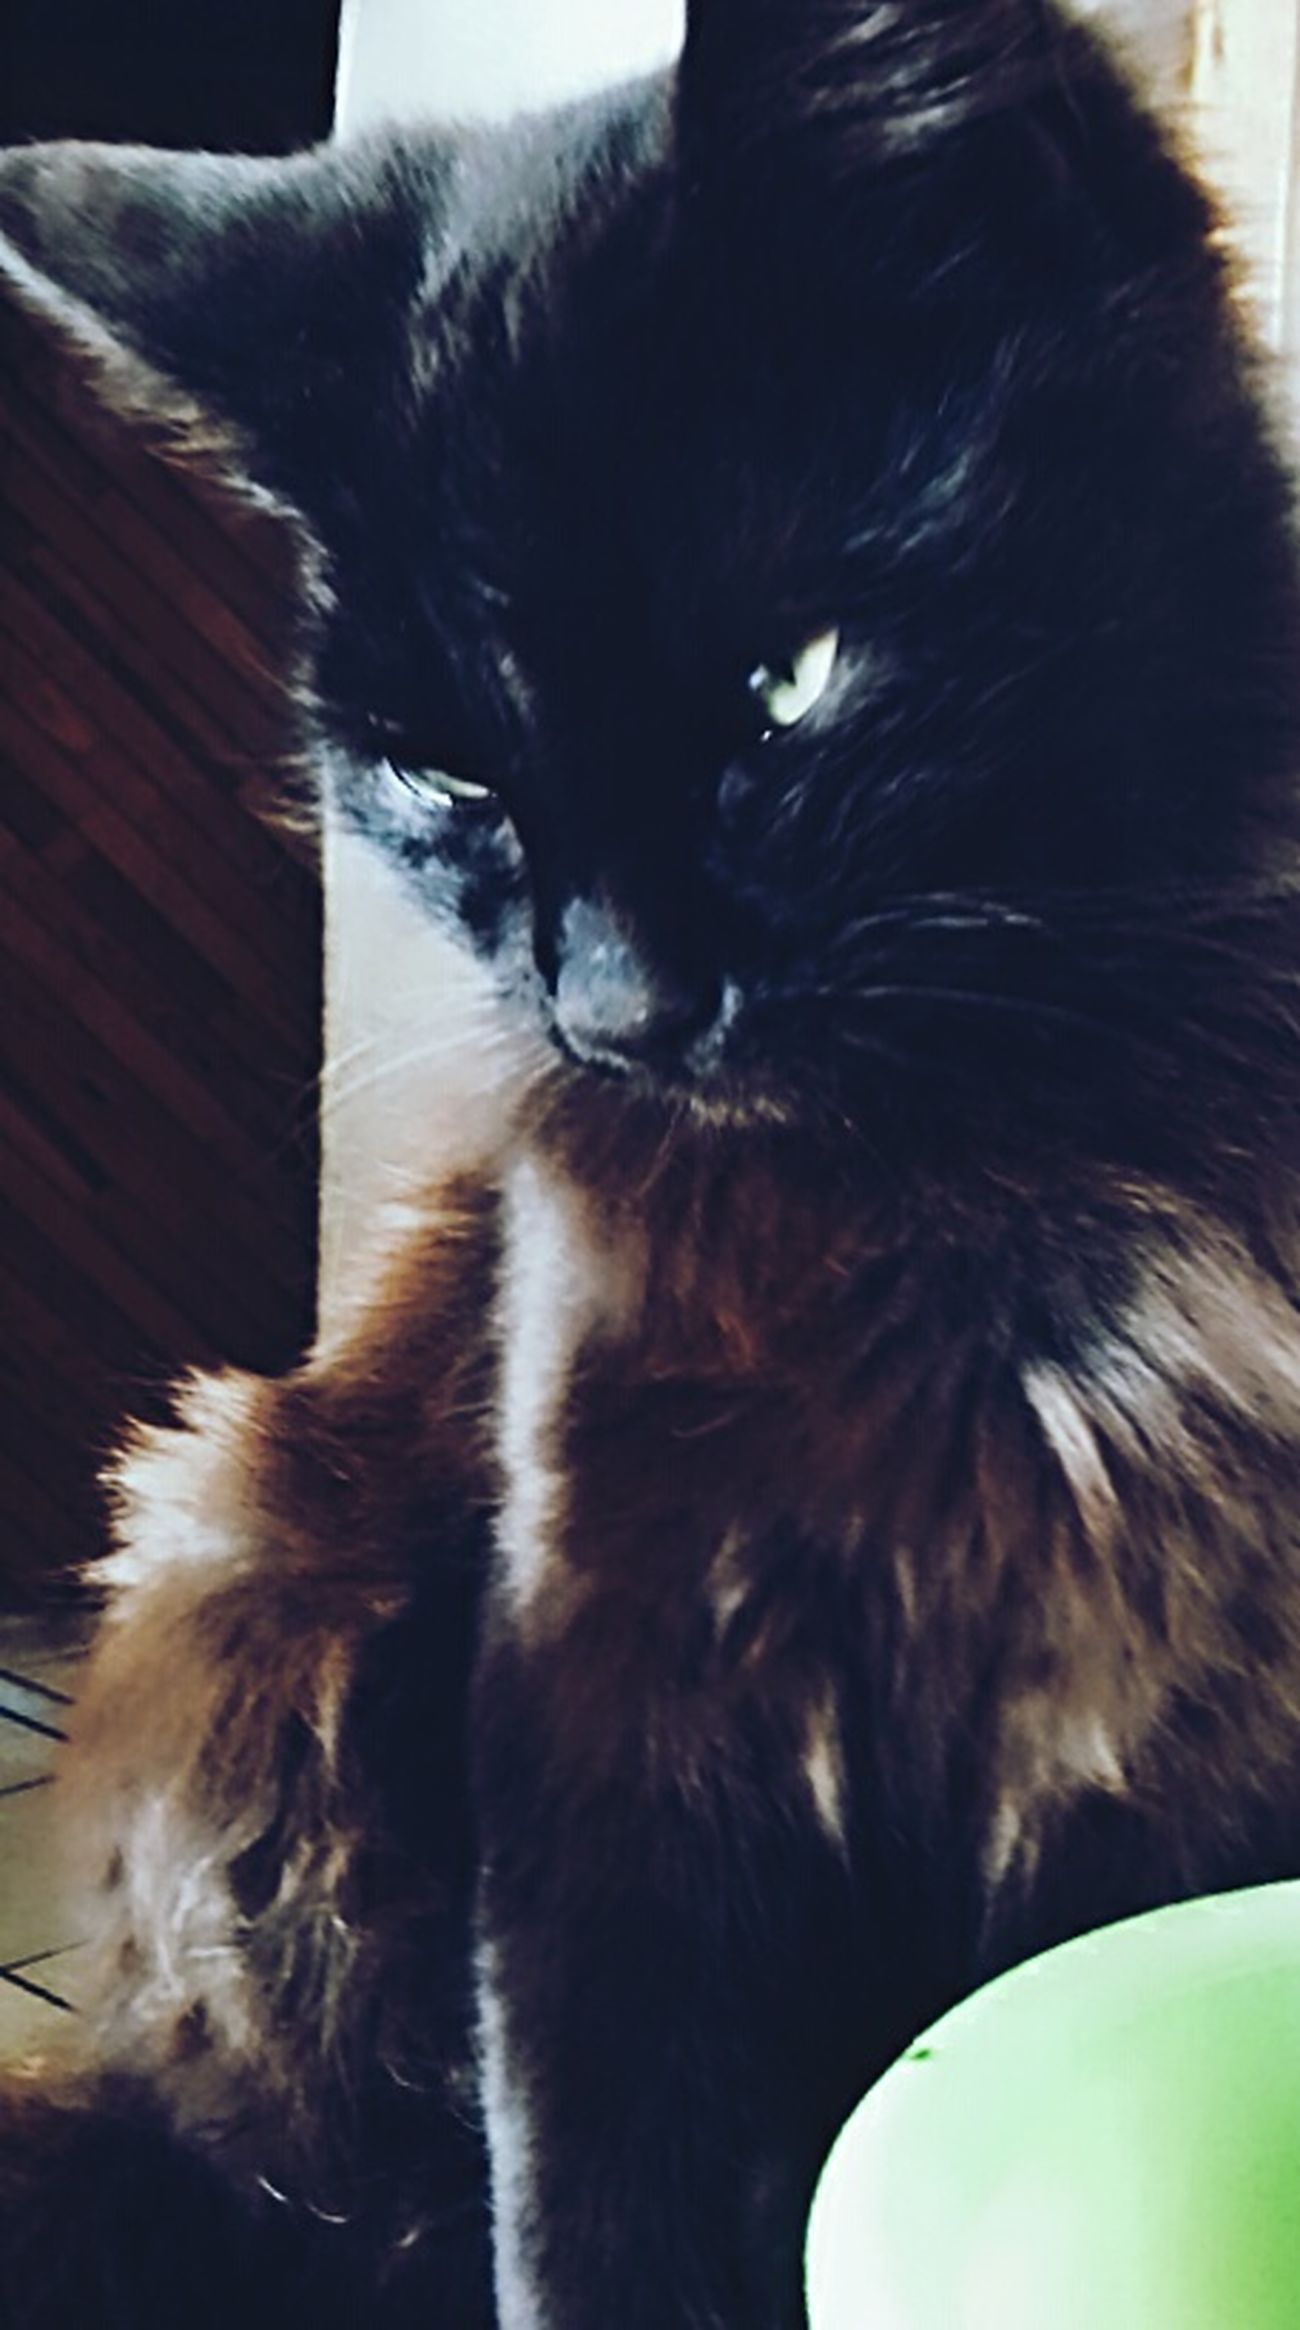 Feline Close-up Cats 🐱 Black Cats Are Beautiful Black Cats Pets Black Cats Lovers Animal Themes Domestic Cat Domestic Animals Kittens Kitty Cat Kitten 🐱 Green Eyes Cat Eyes Black Cat Head Shot